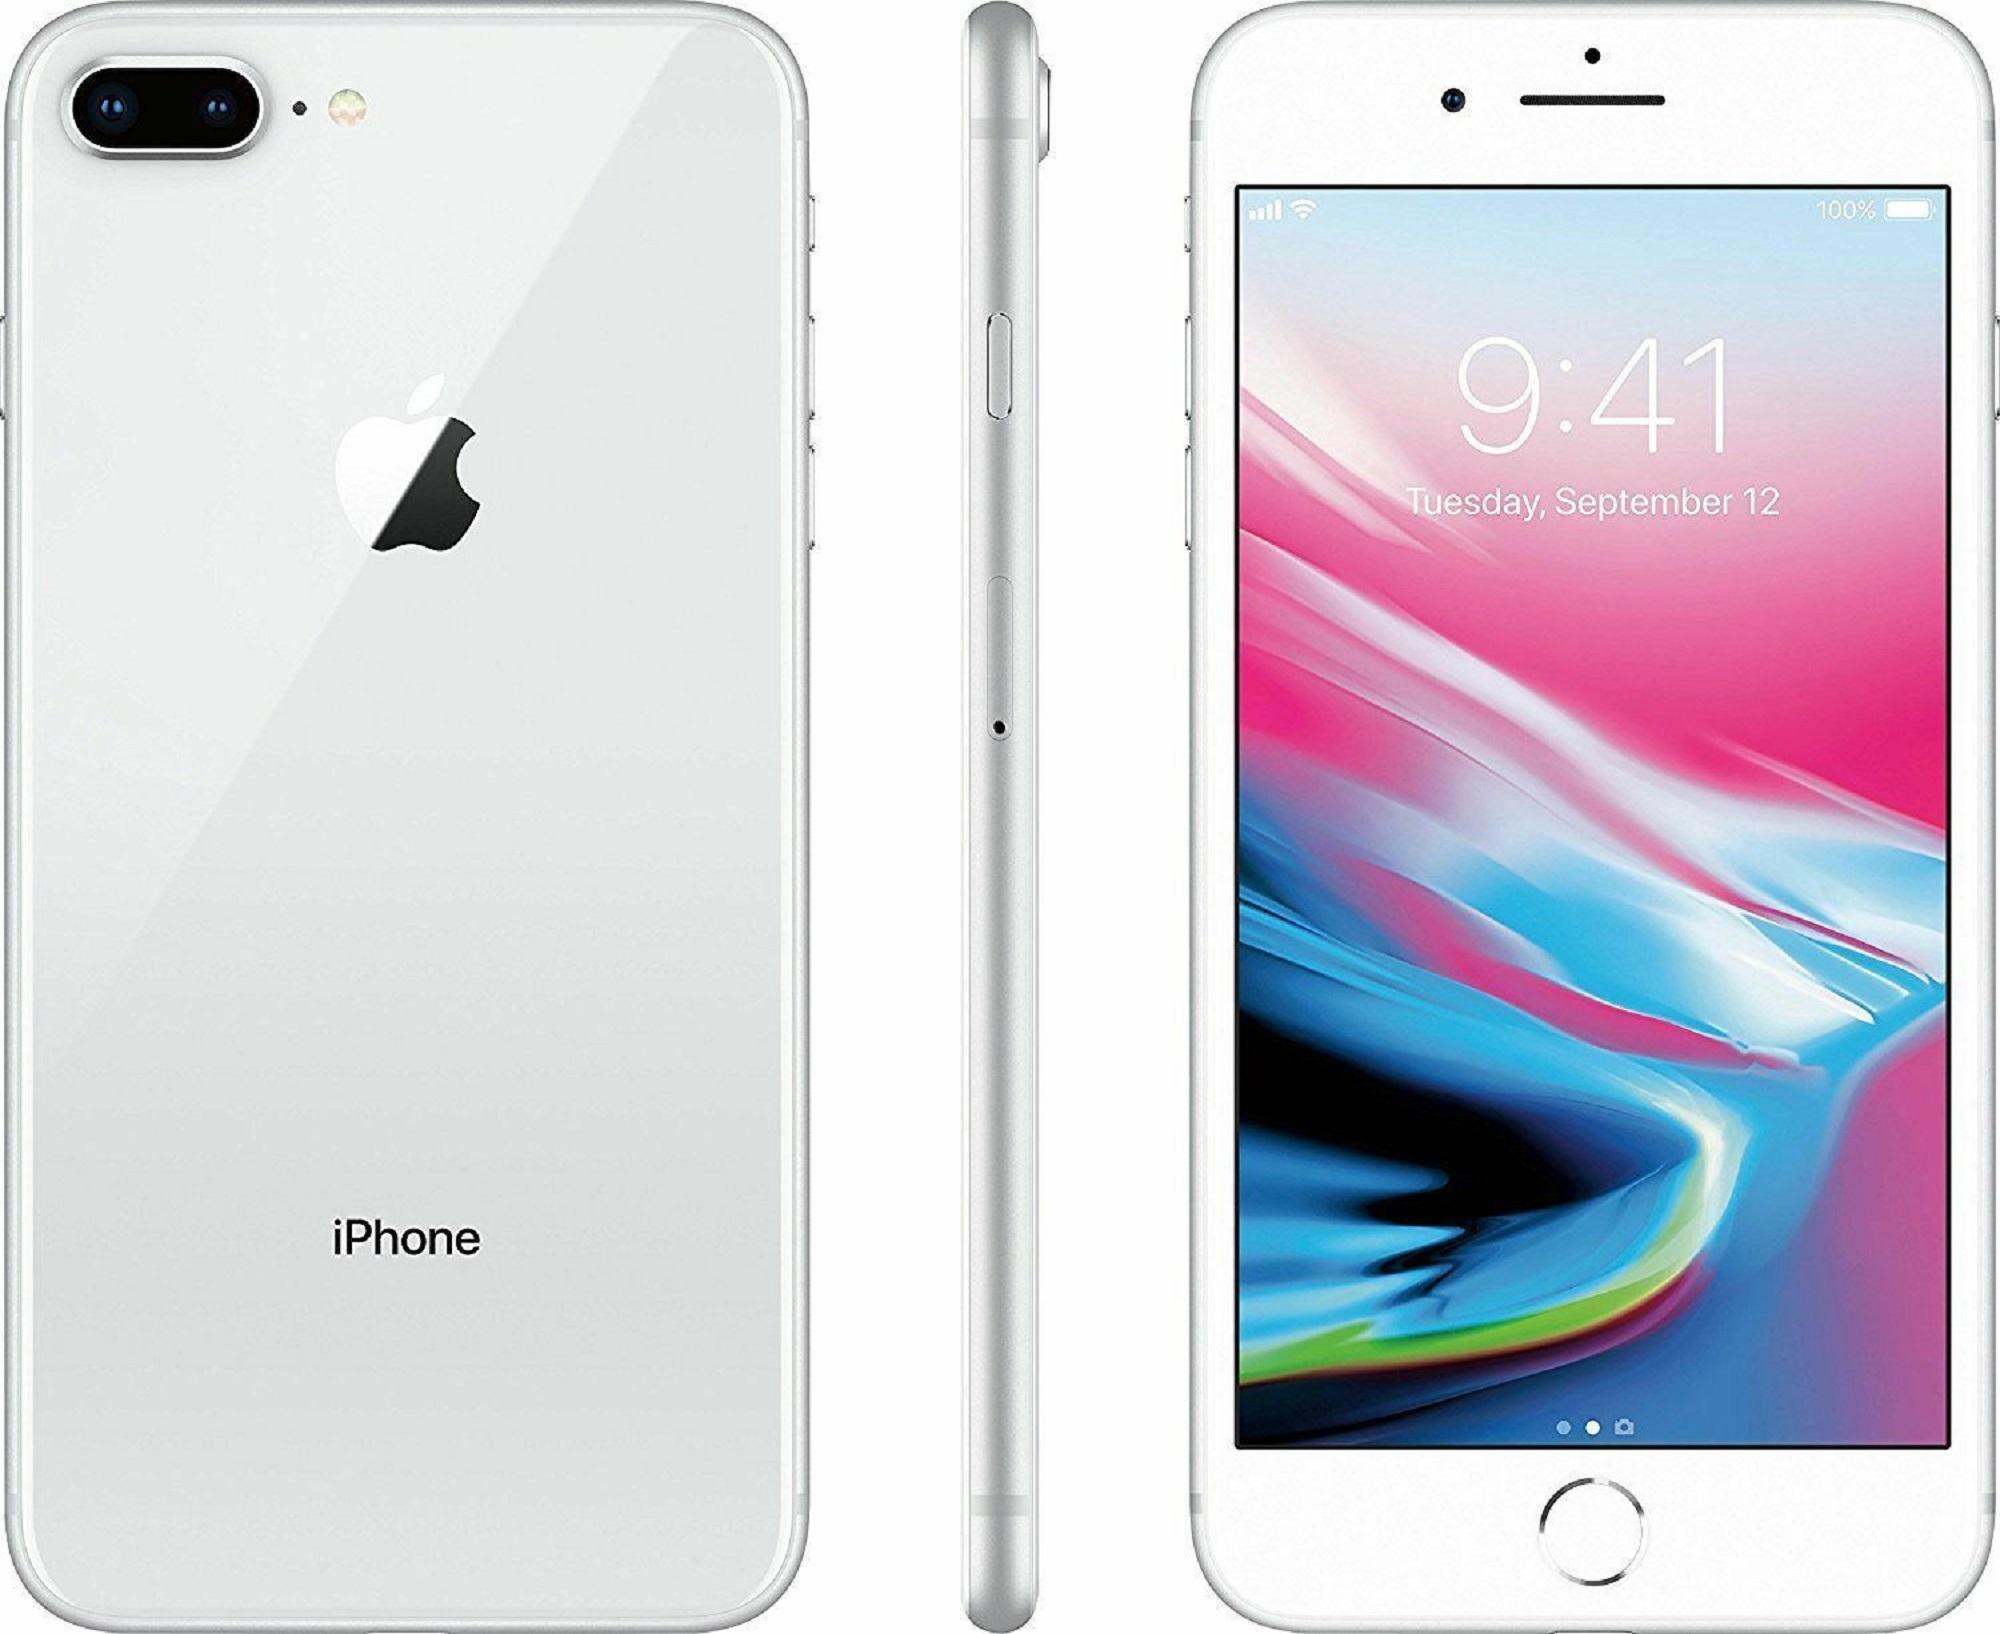 thumbnail 5 - Apple iPhone 8 Plus 64GB Factory Unlocked Smartphone - Very Good